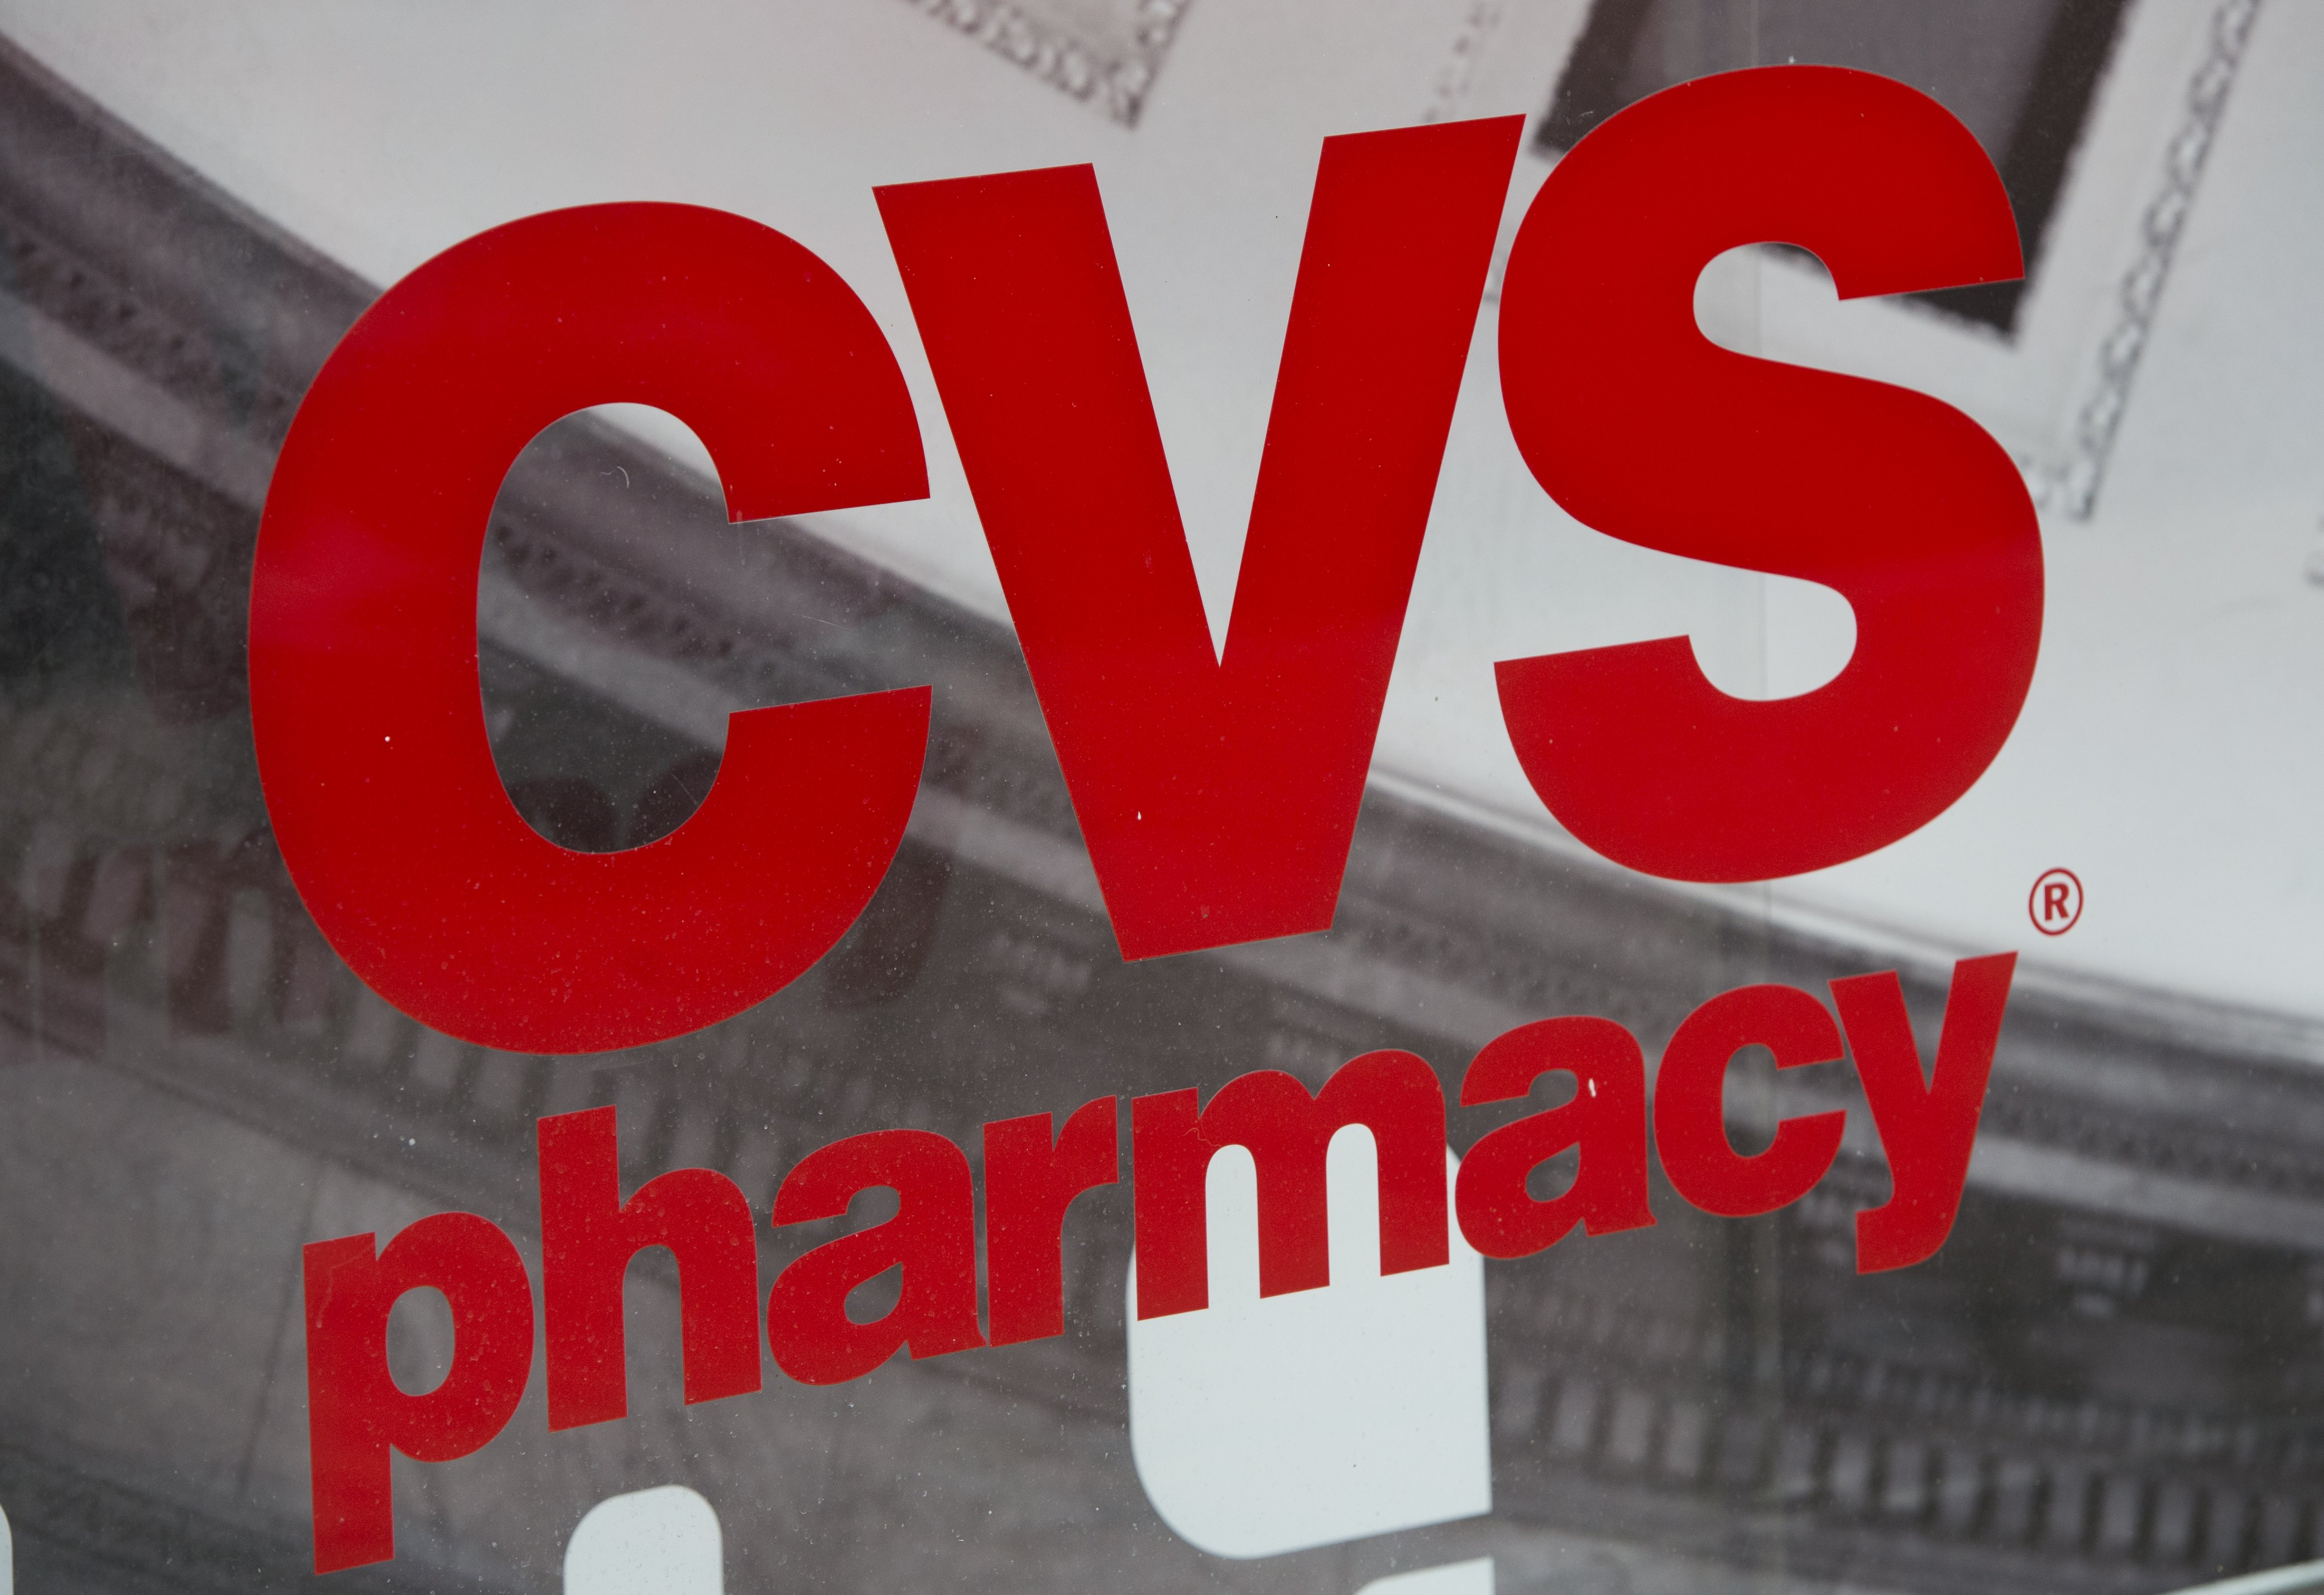 CVS tightens restrictions on opioid prescriptions in bid to